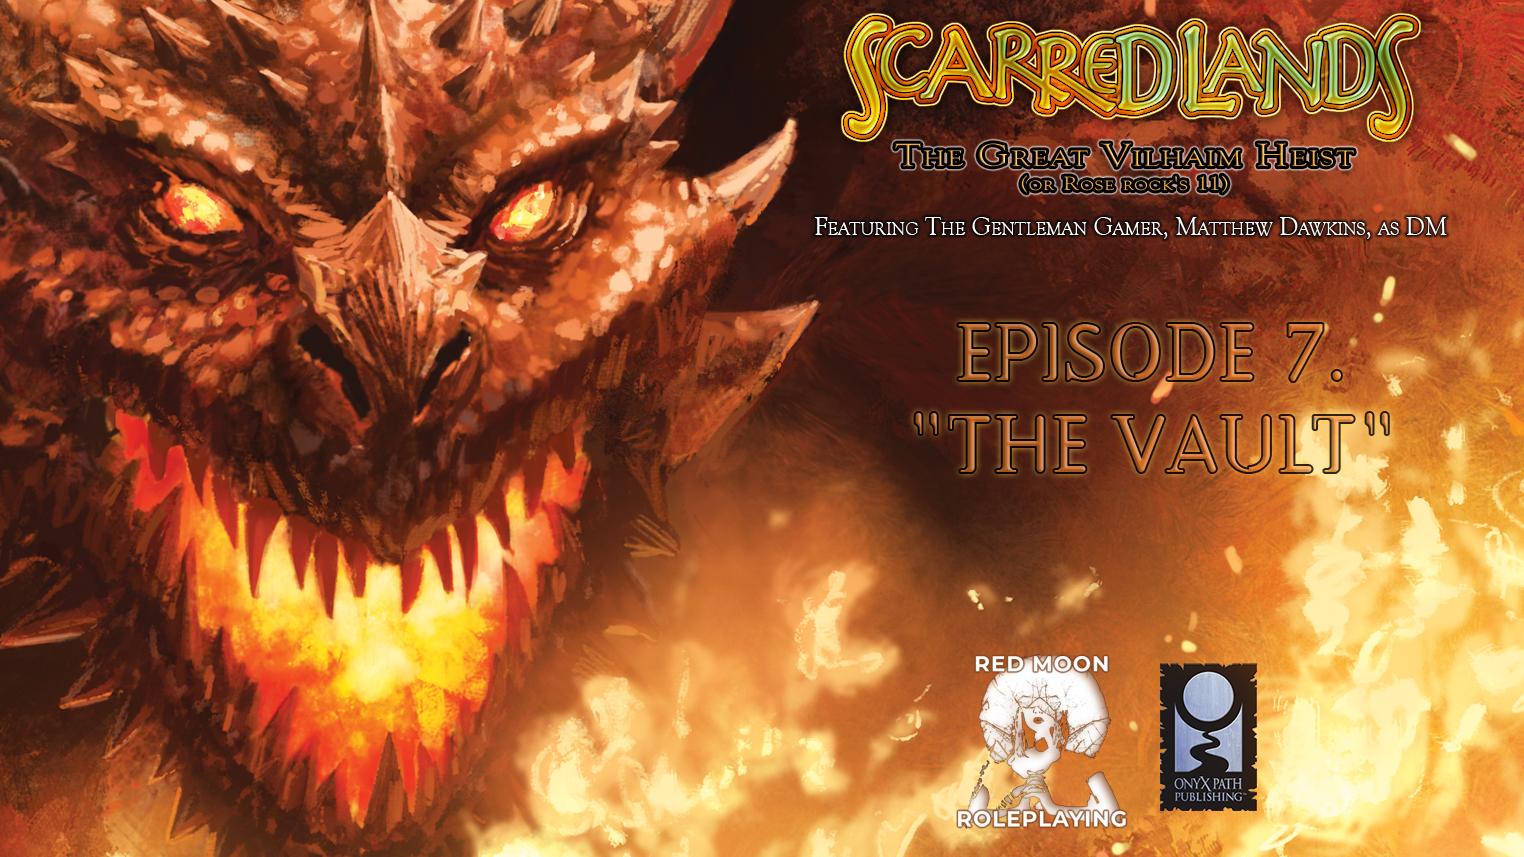 SCARRED_07.jpg